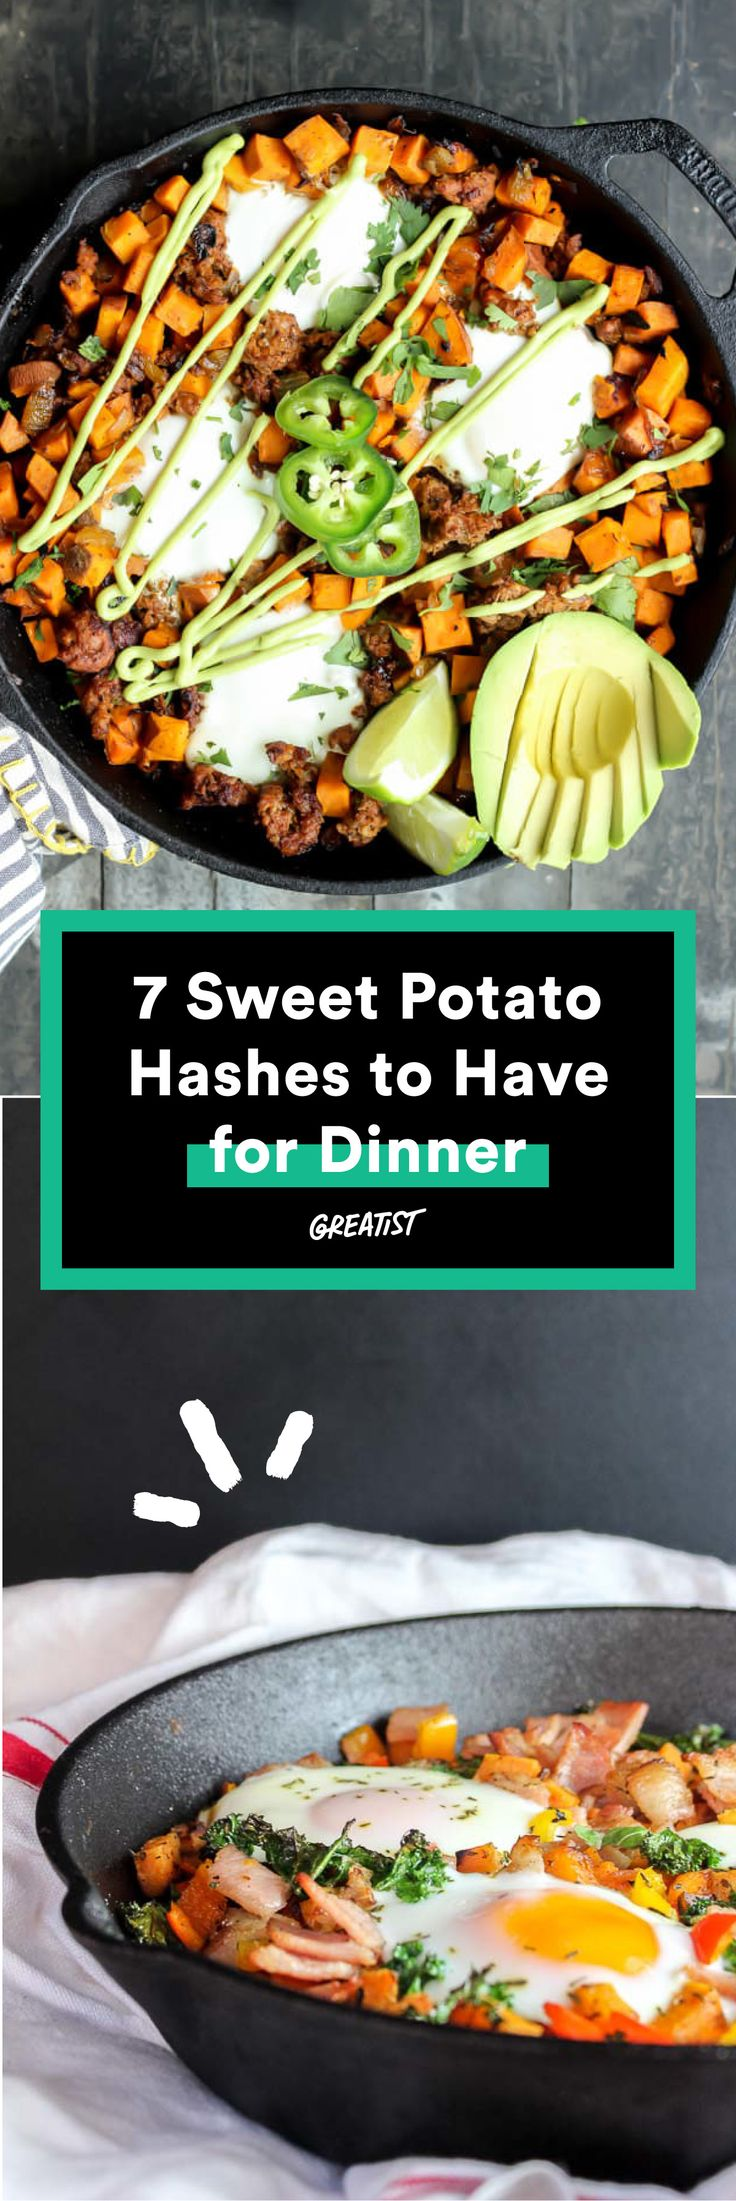 Buh-bye, boring white potatoes. #healthy #sweetpotato #hash #recipes http://greatist.com/eat/sweet-potato-hash-recipes-for-breakfast-or-dinner